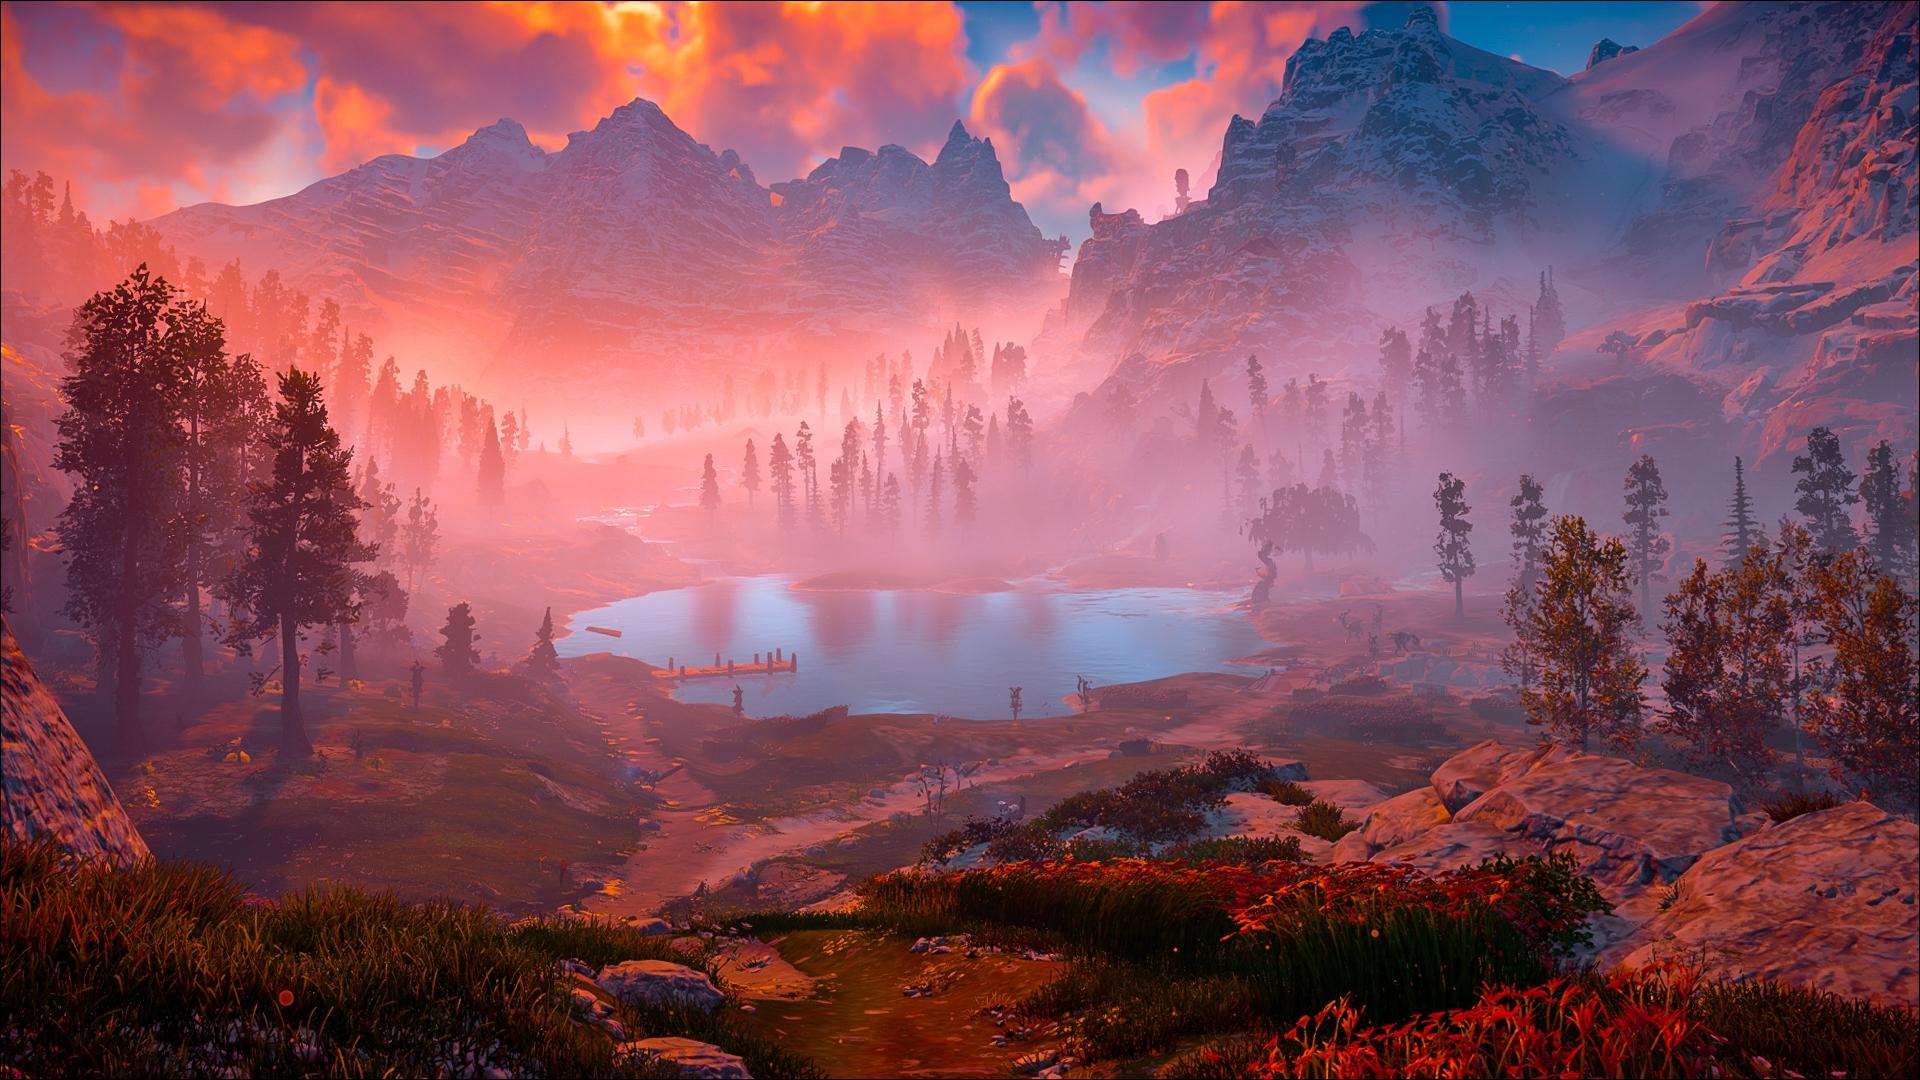 Horizon Zero Dawn Desktop Background: Horizon Zero Dawn Game Nature, HD Games, 4k Wallpapers